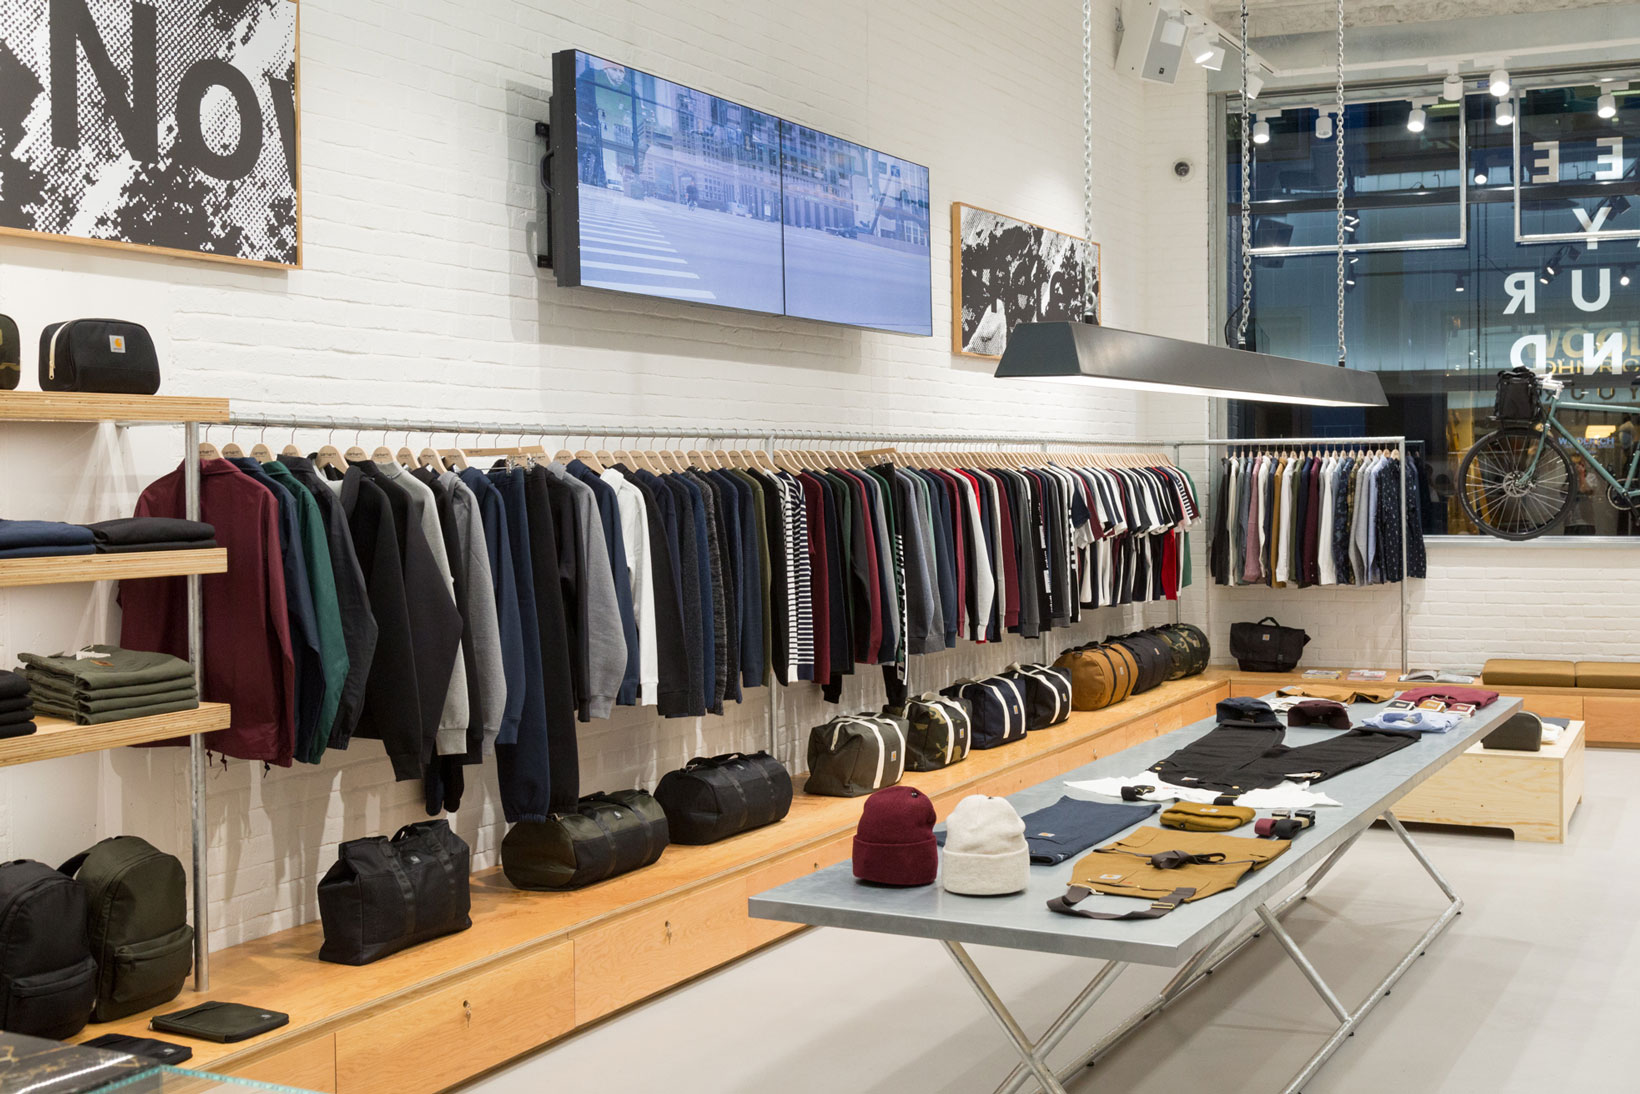 The Carhartt WIP Store in Soho, London | HYPEBEAST